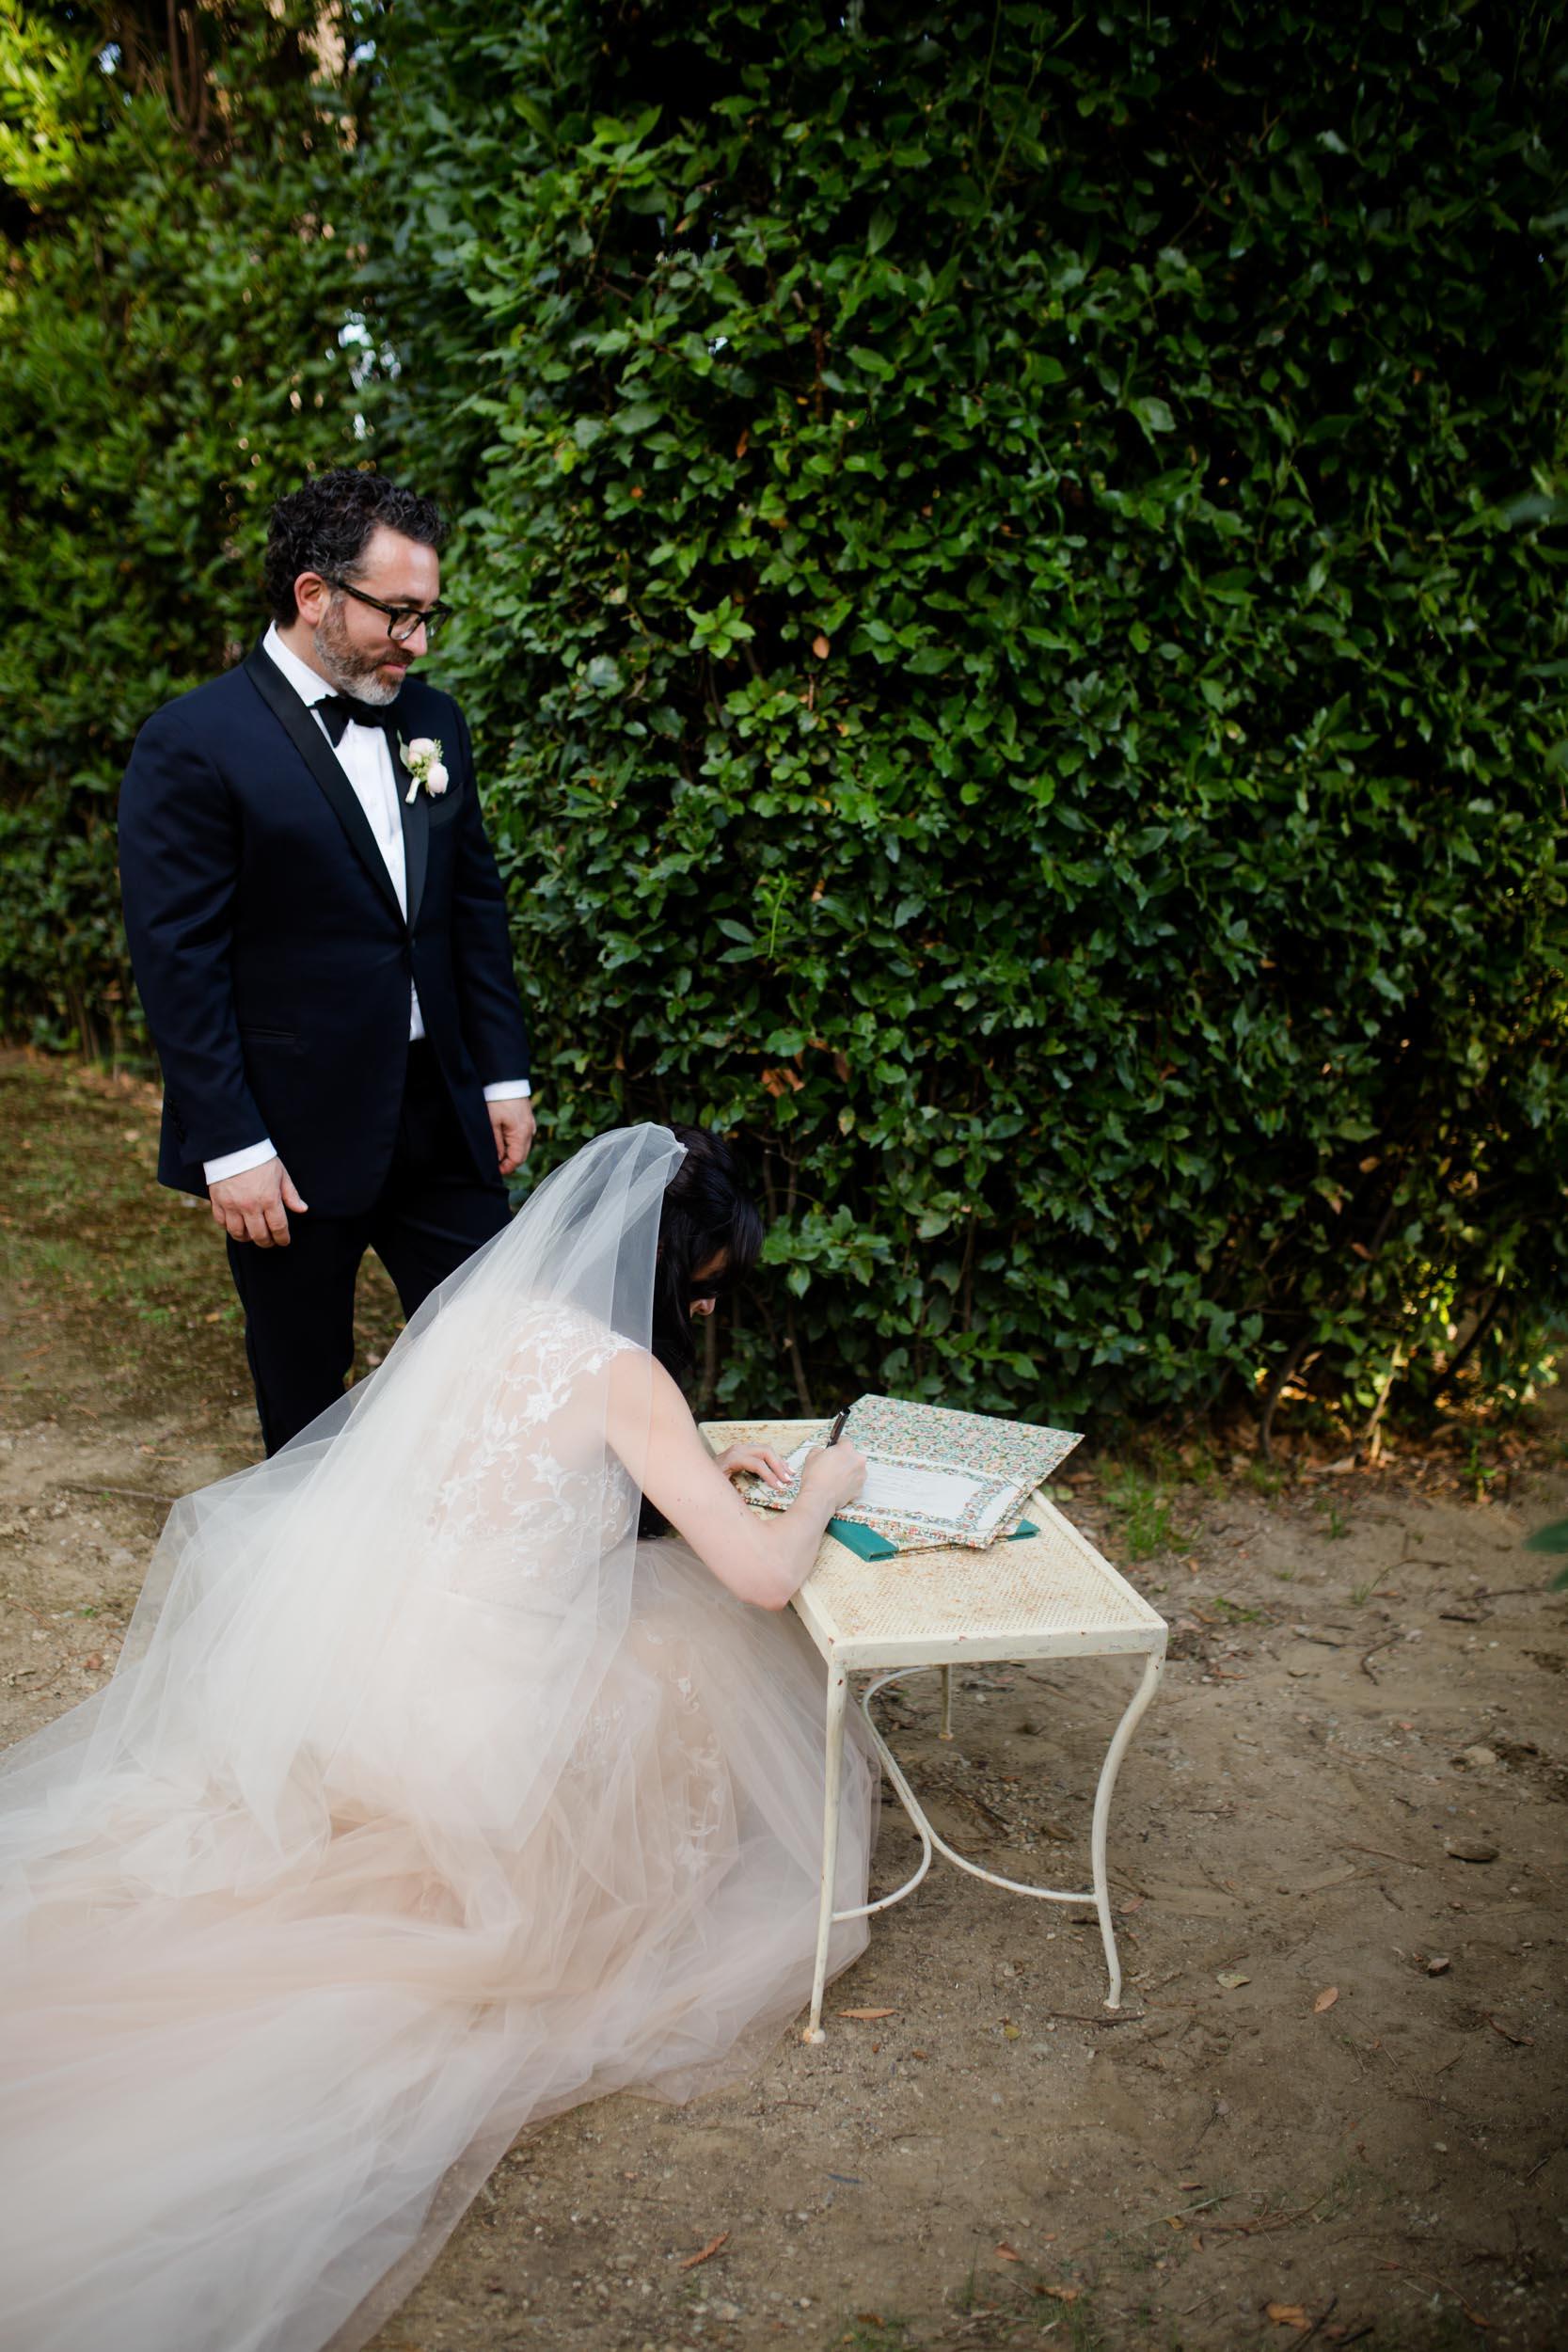 villa-gamberaia-florence-italy-destination-wedding-41.jpg